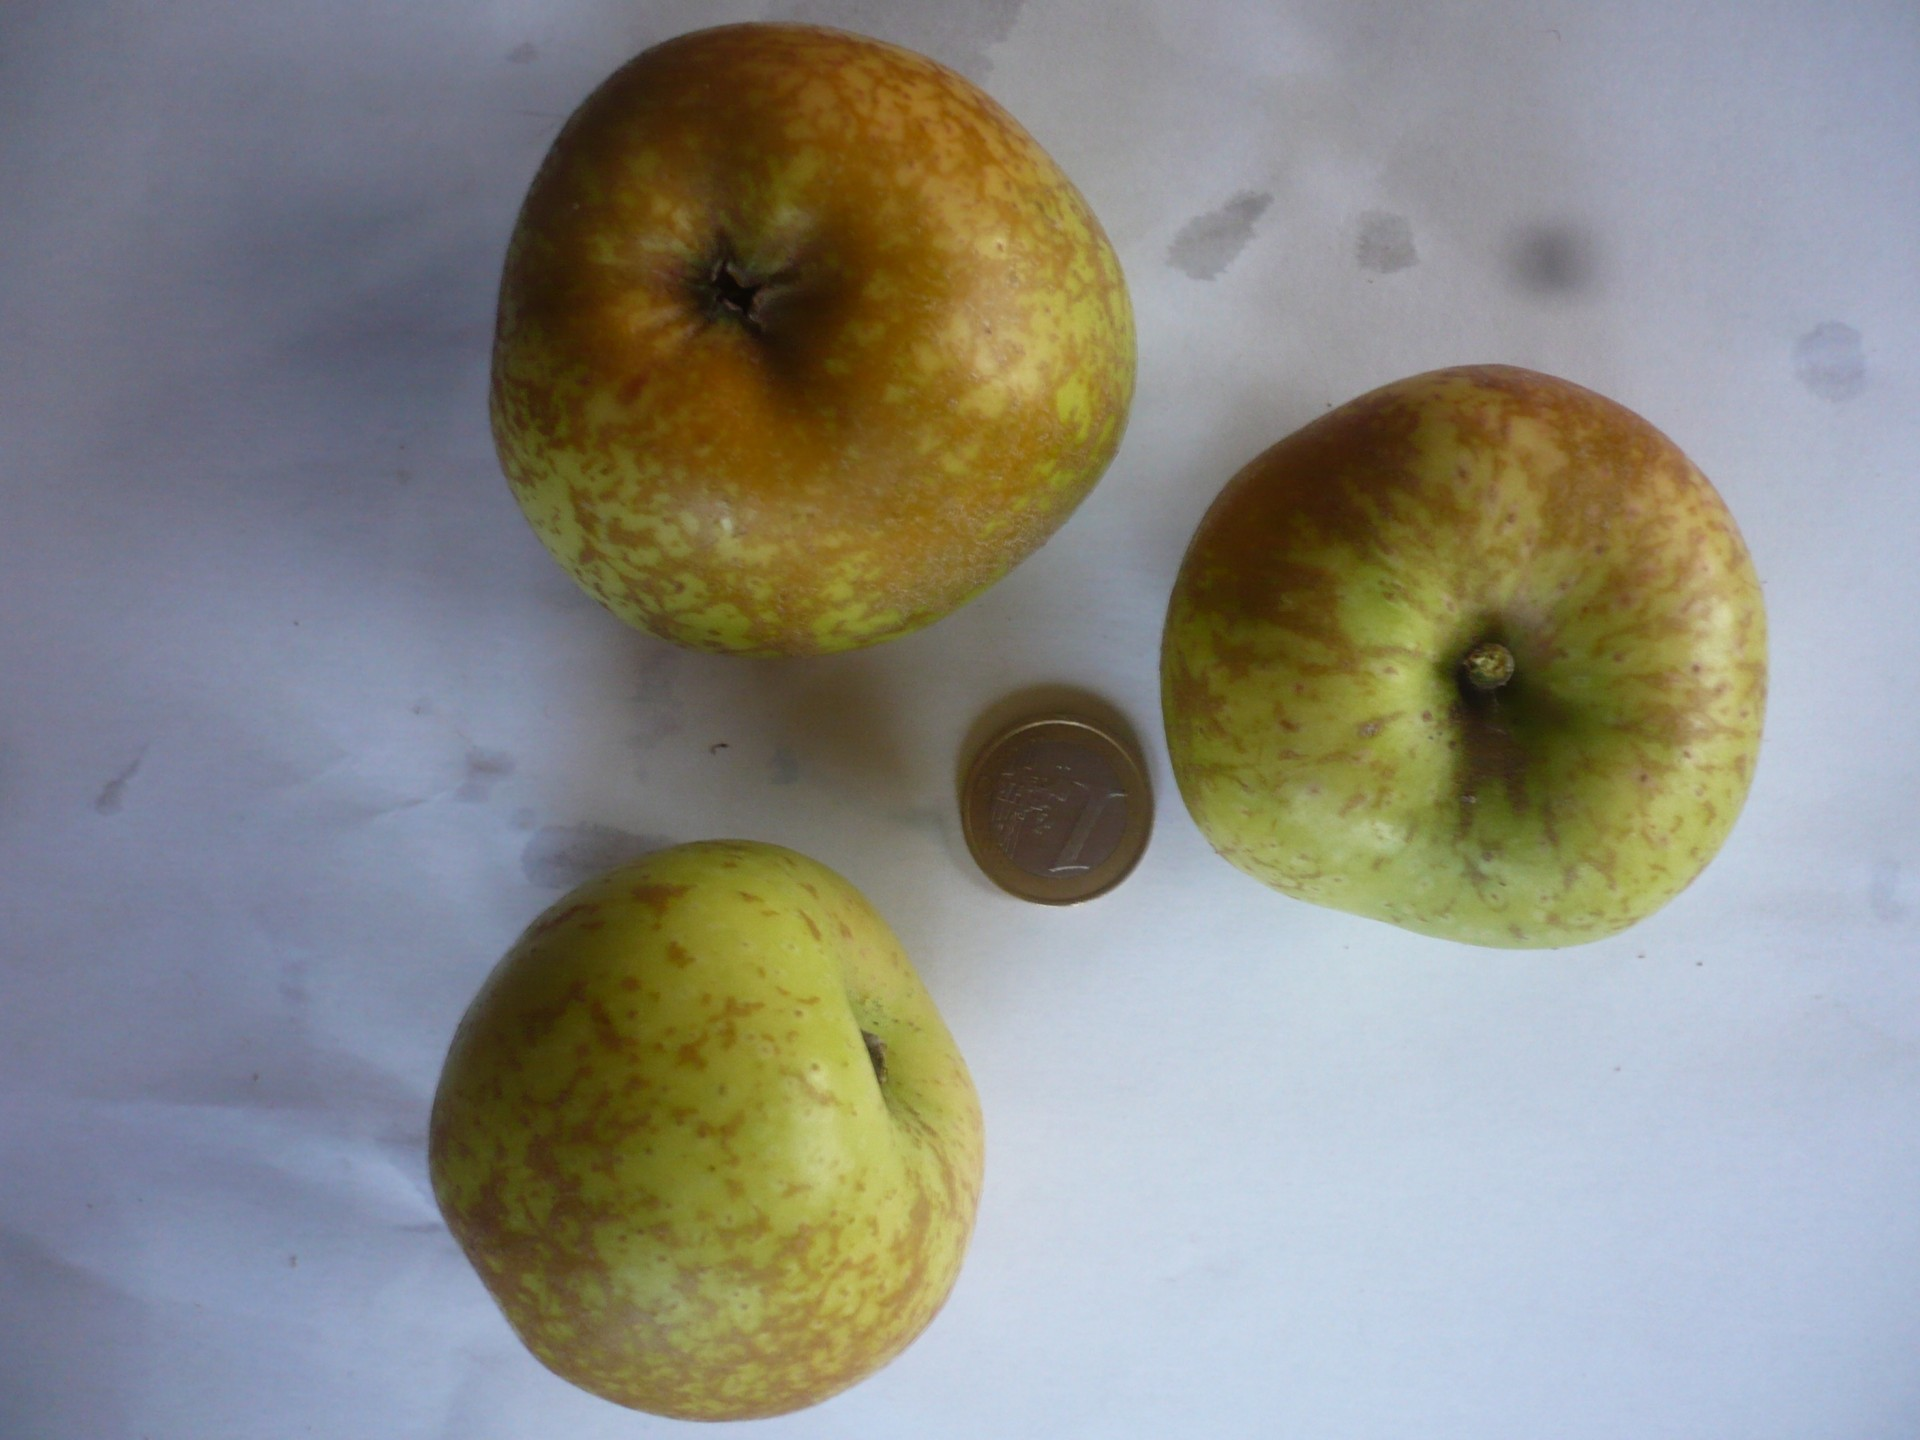 Reinette marbrée d'Auvergne